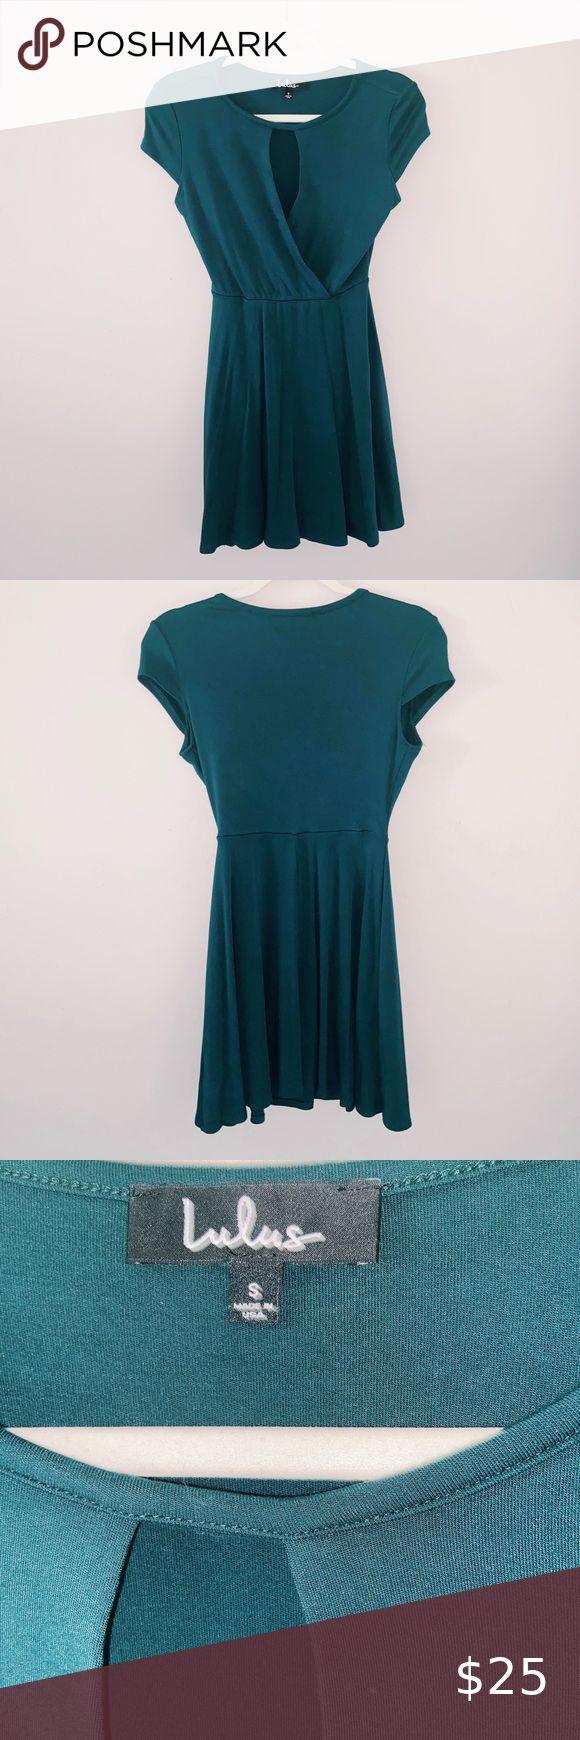 Lulus Dress in 2020 Lulu dresses, Clothes design, Fashion